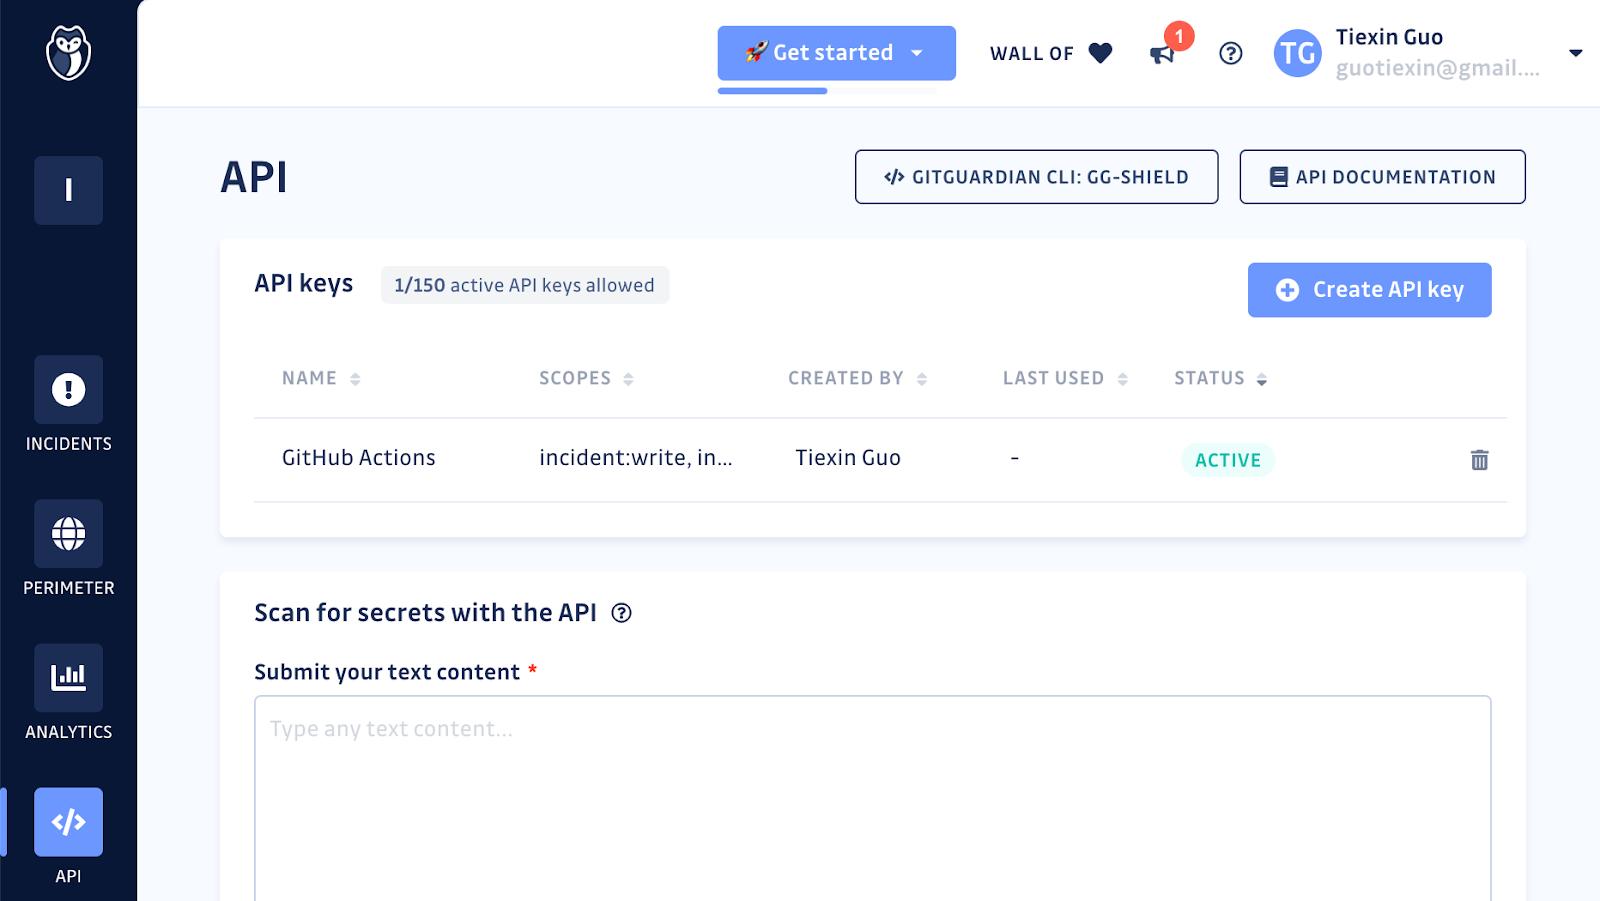 Generating an API key from the GitGuardian dashboard